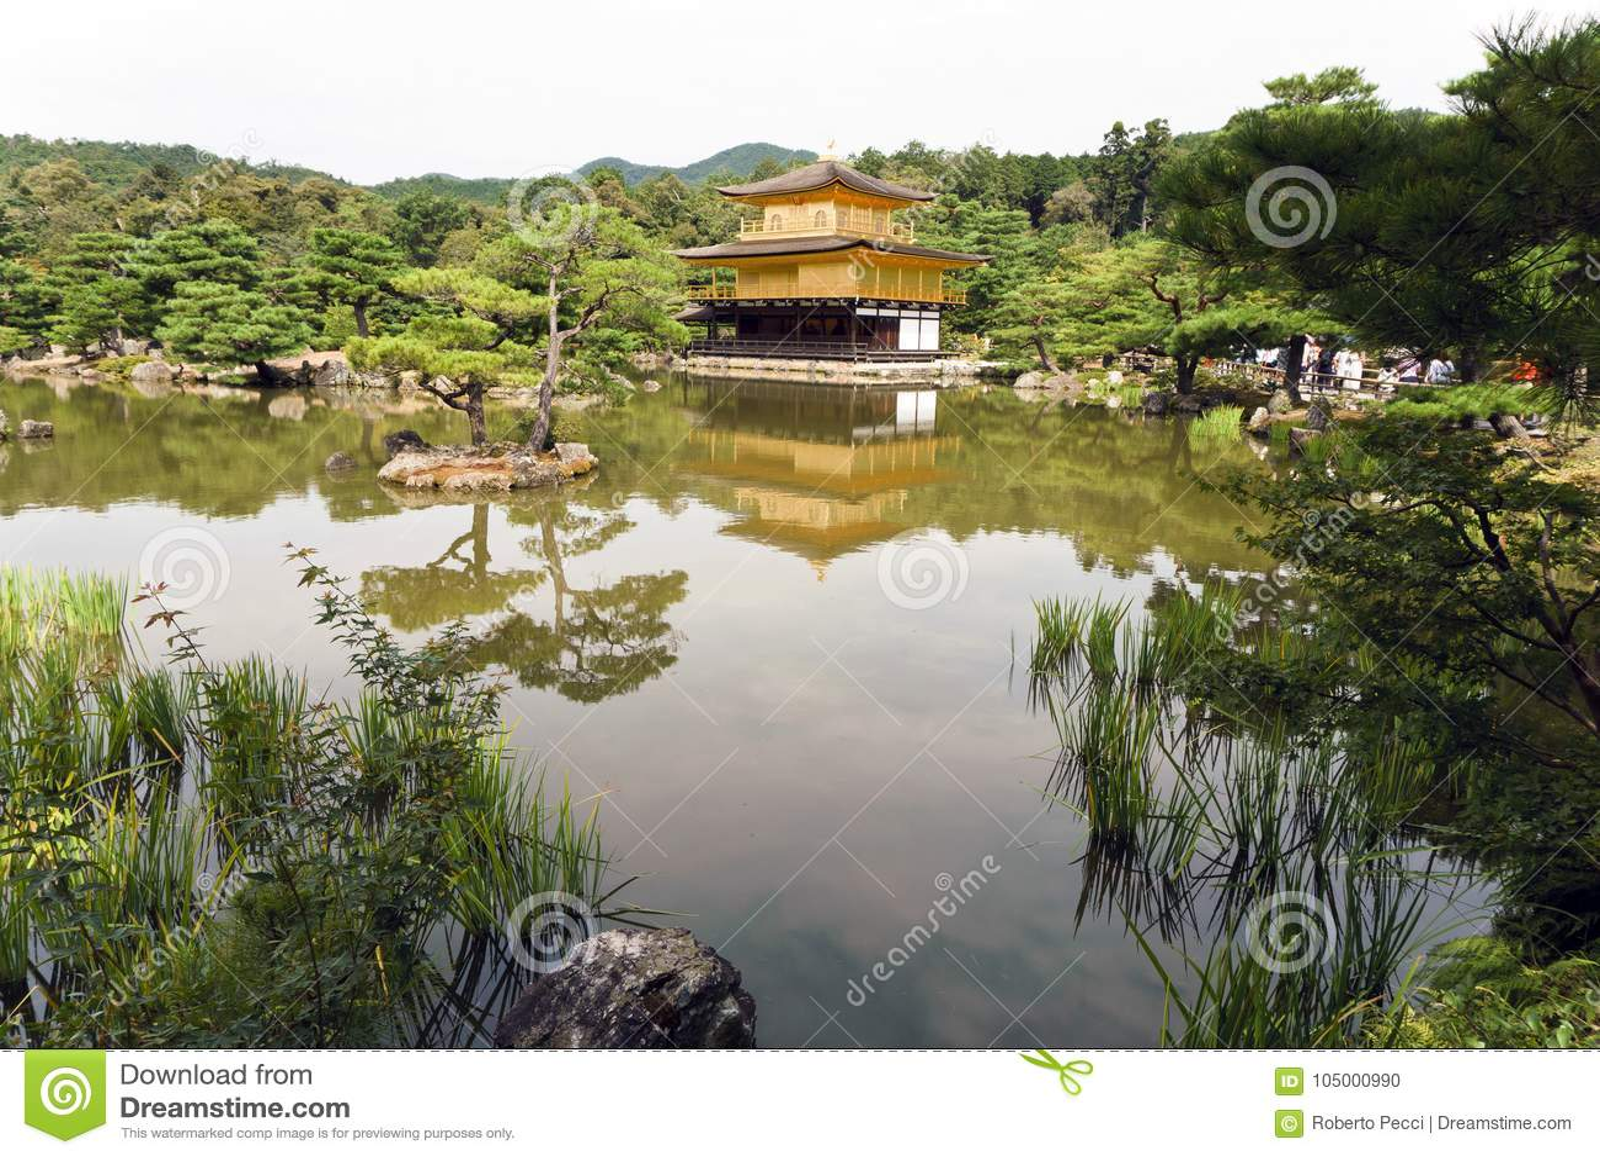 Japan, Kyoto, das Kinkakuji oder goldener Pavillon